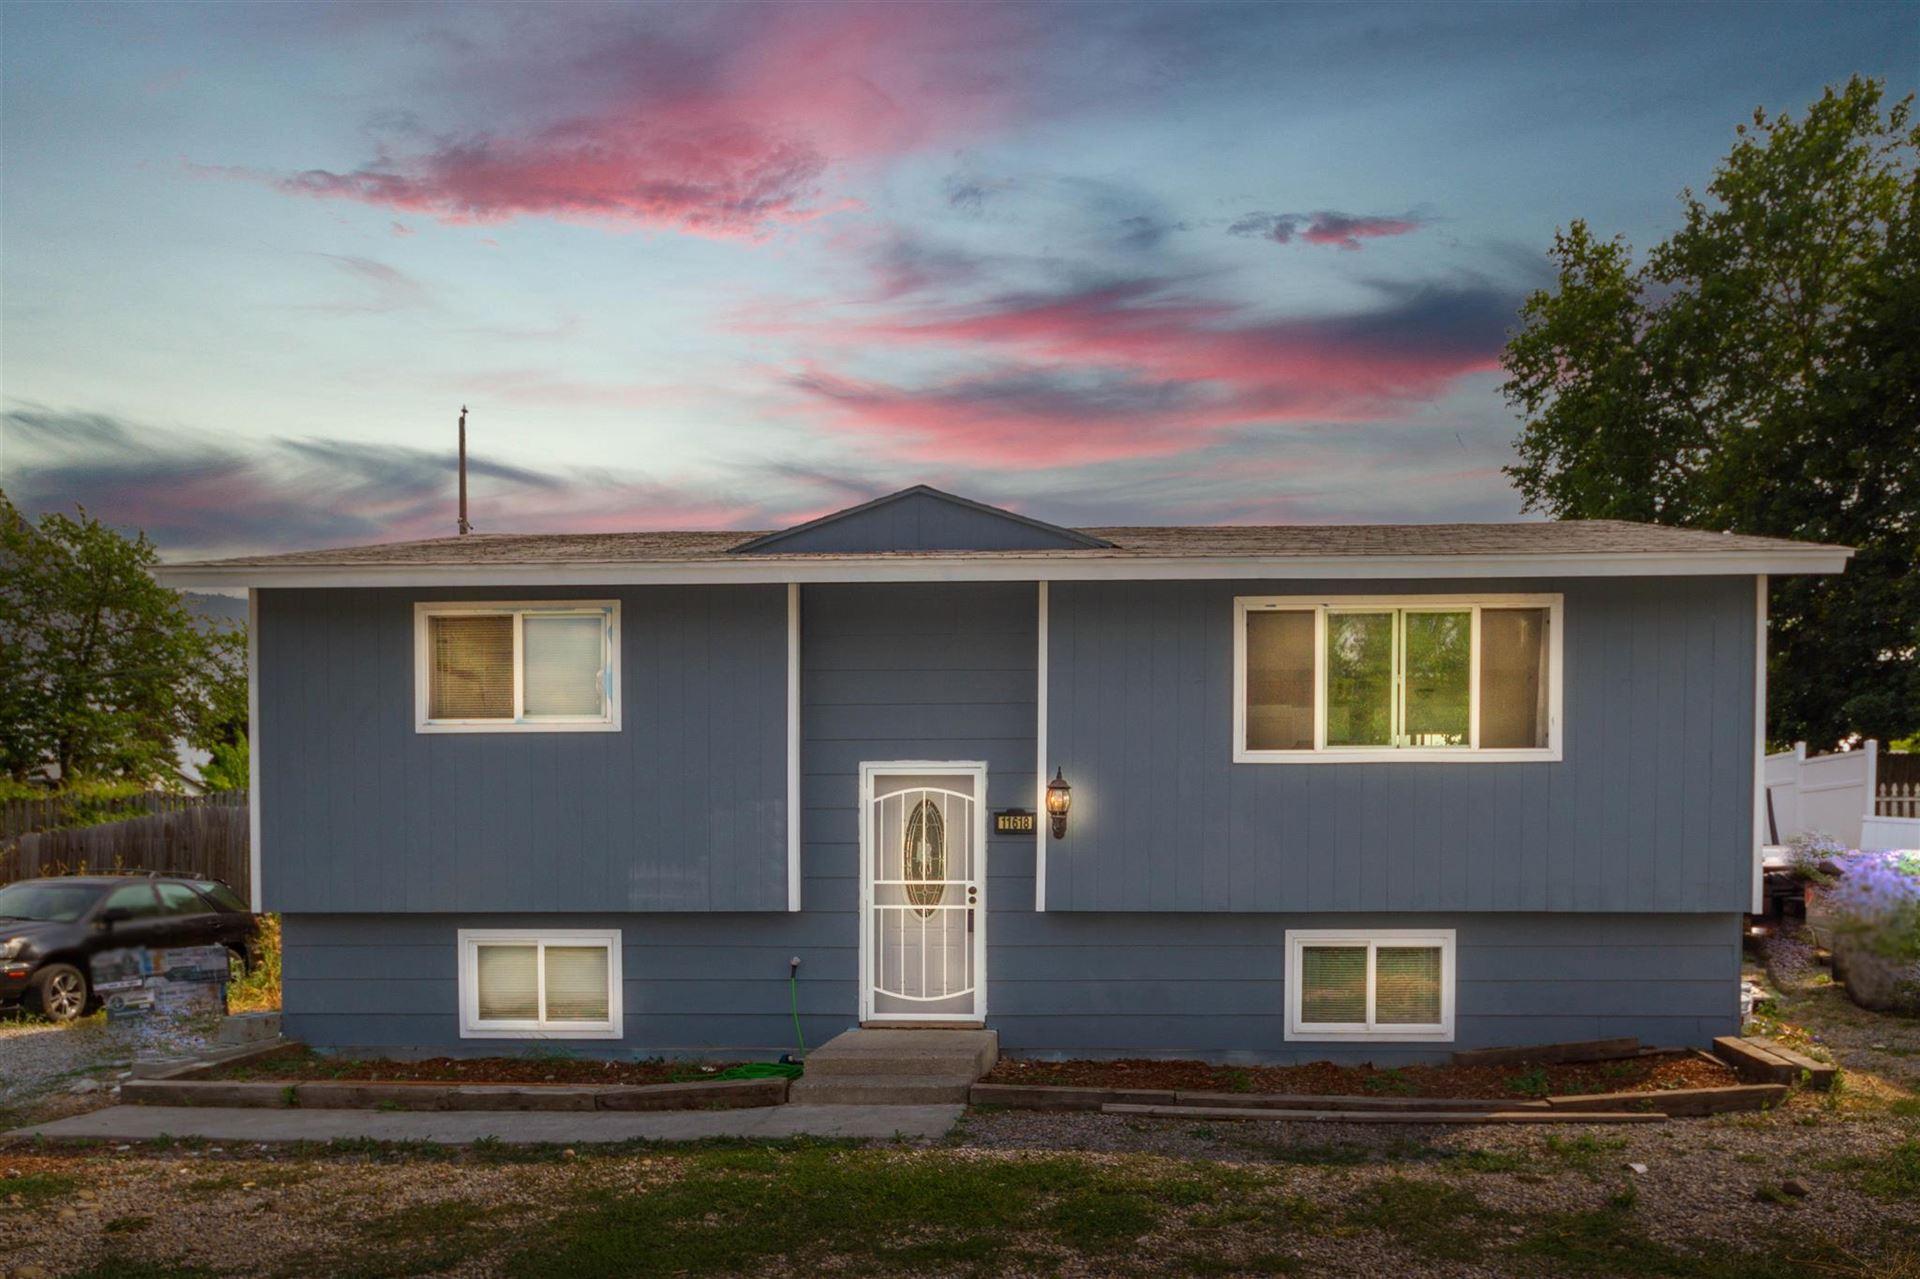 11618 E Frederick Ave, Spokane Valley, WA 99206-2626 - #: 202119722